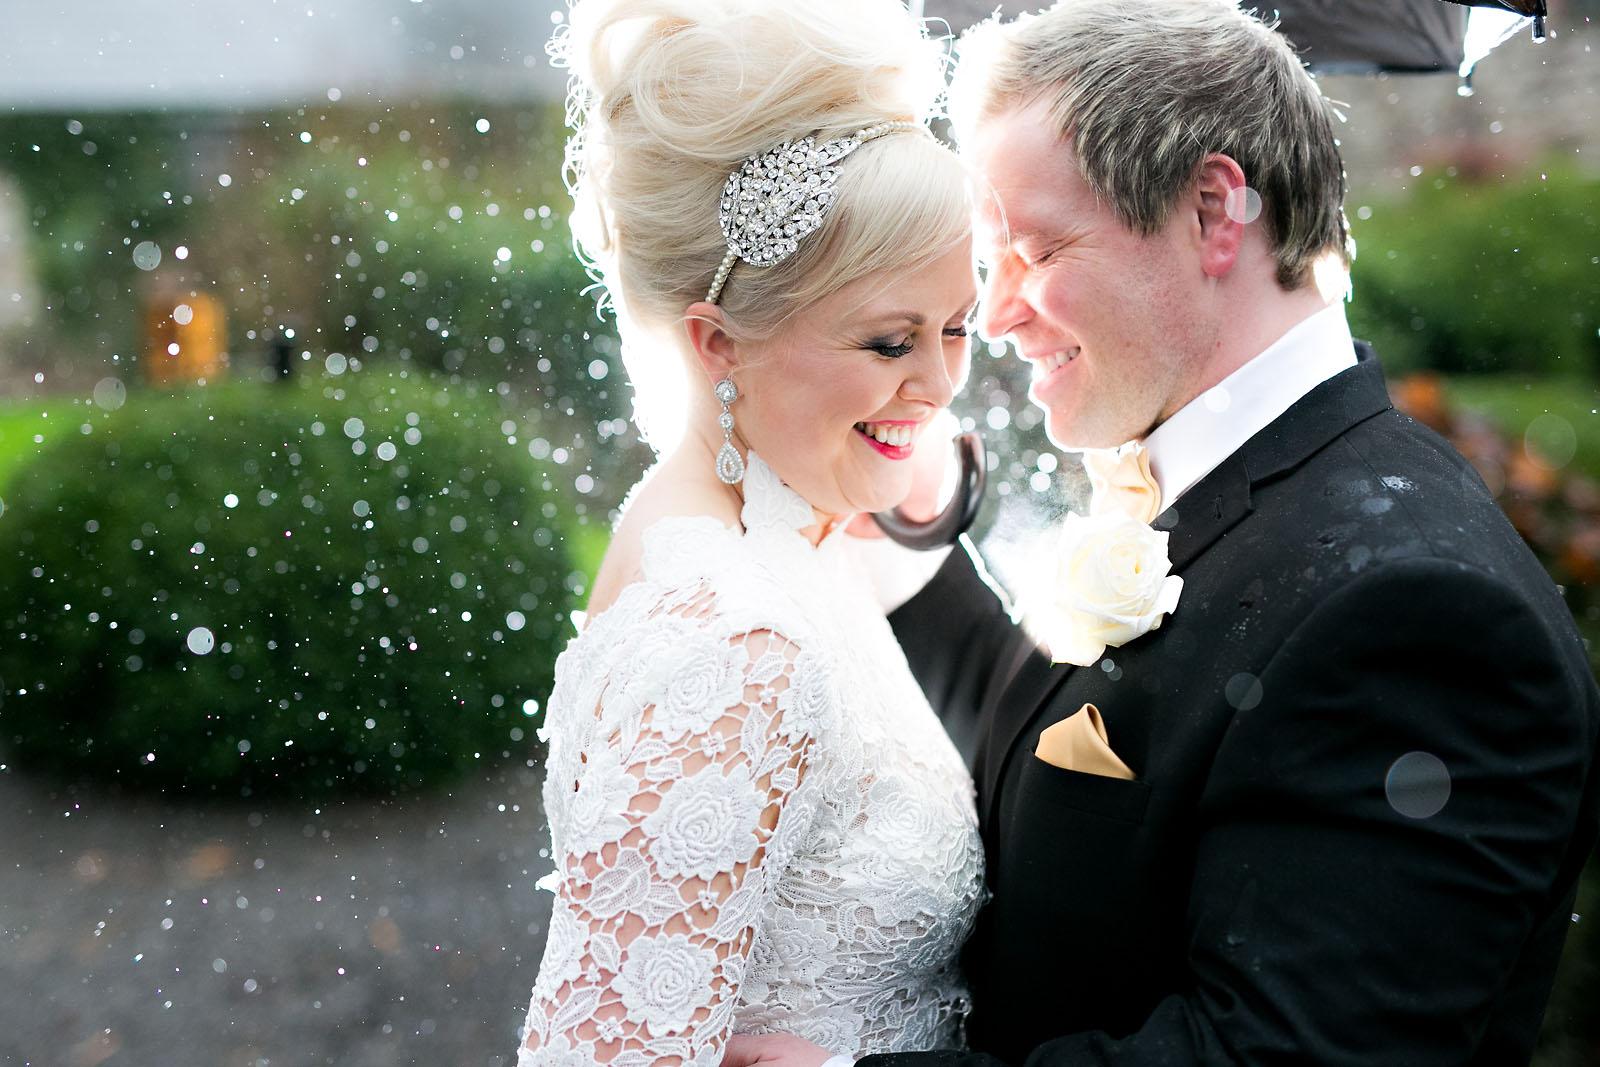 beautiful-blonde-bride-groom-rainy-wedding-day